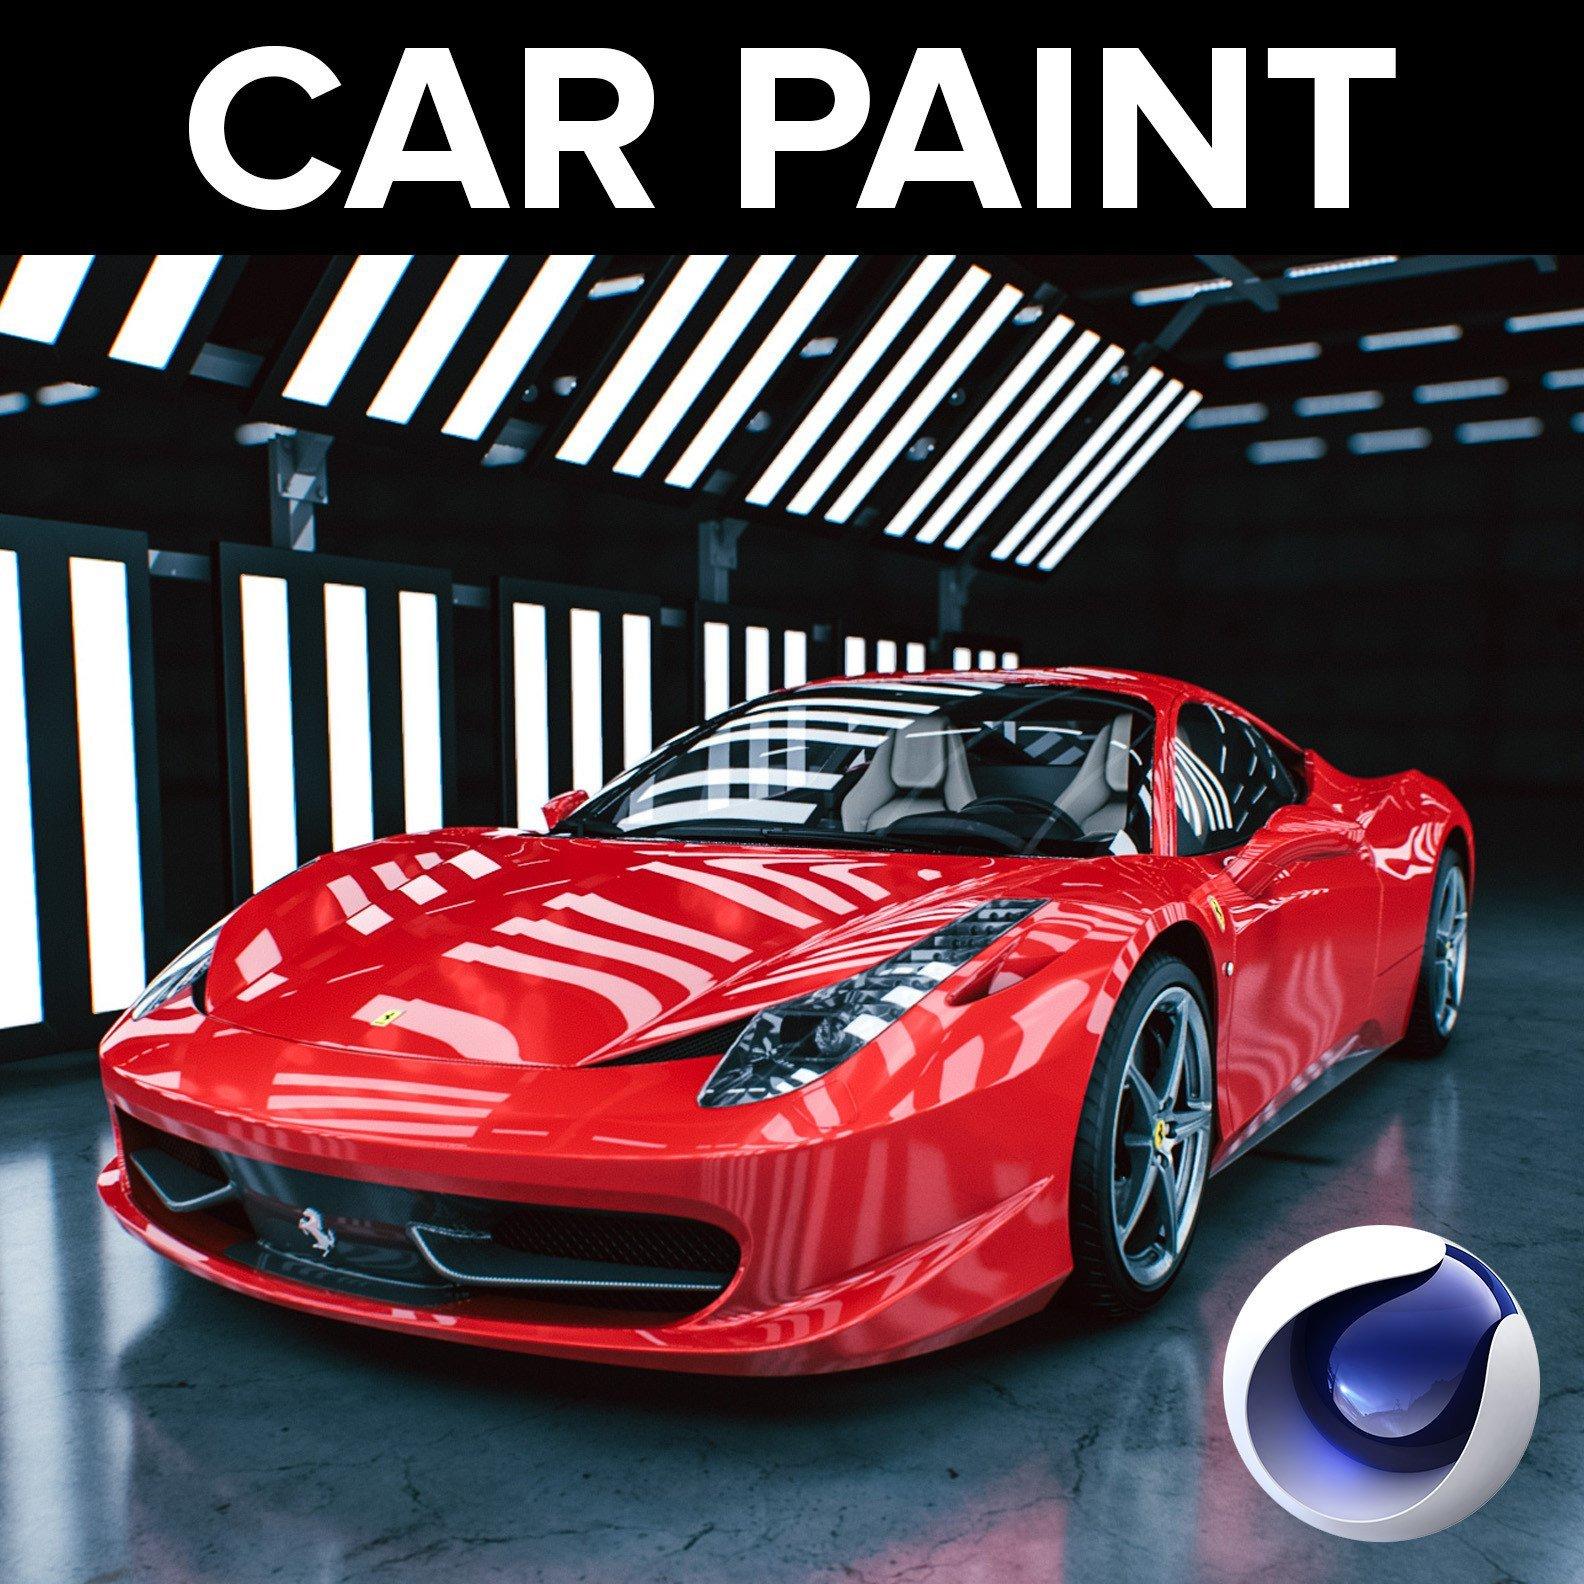 cinema 4d car paint create beautiful car renders in cinema 4d. Black Bedroom Furniture Sets. Home Design Ideas